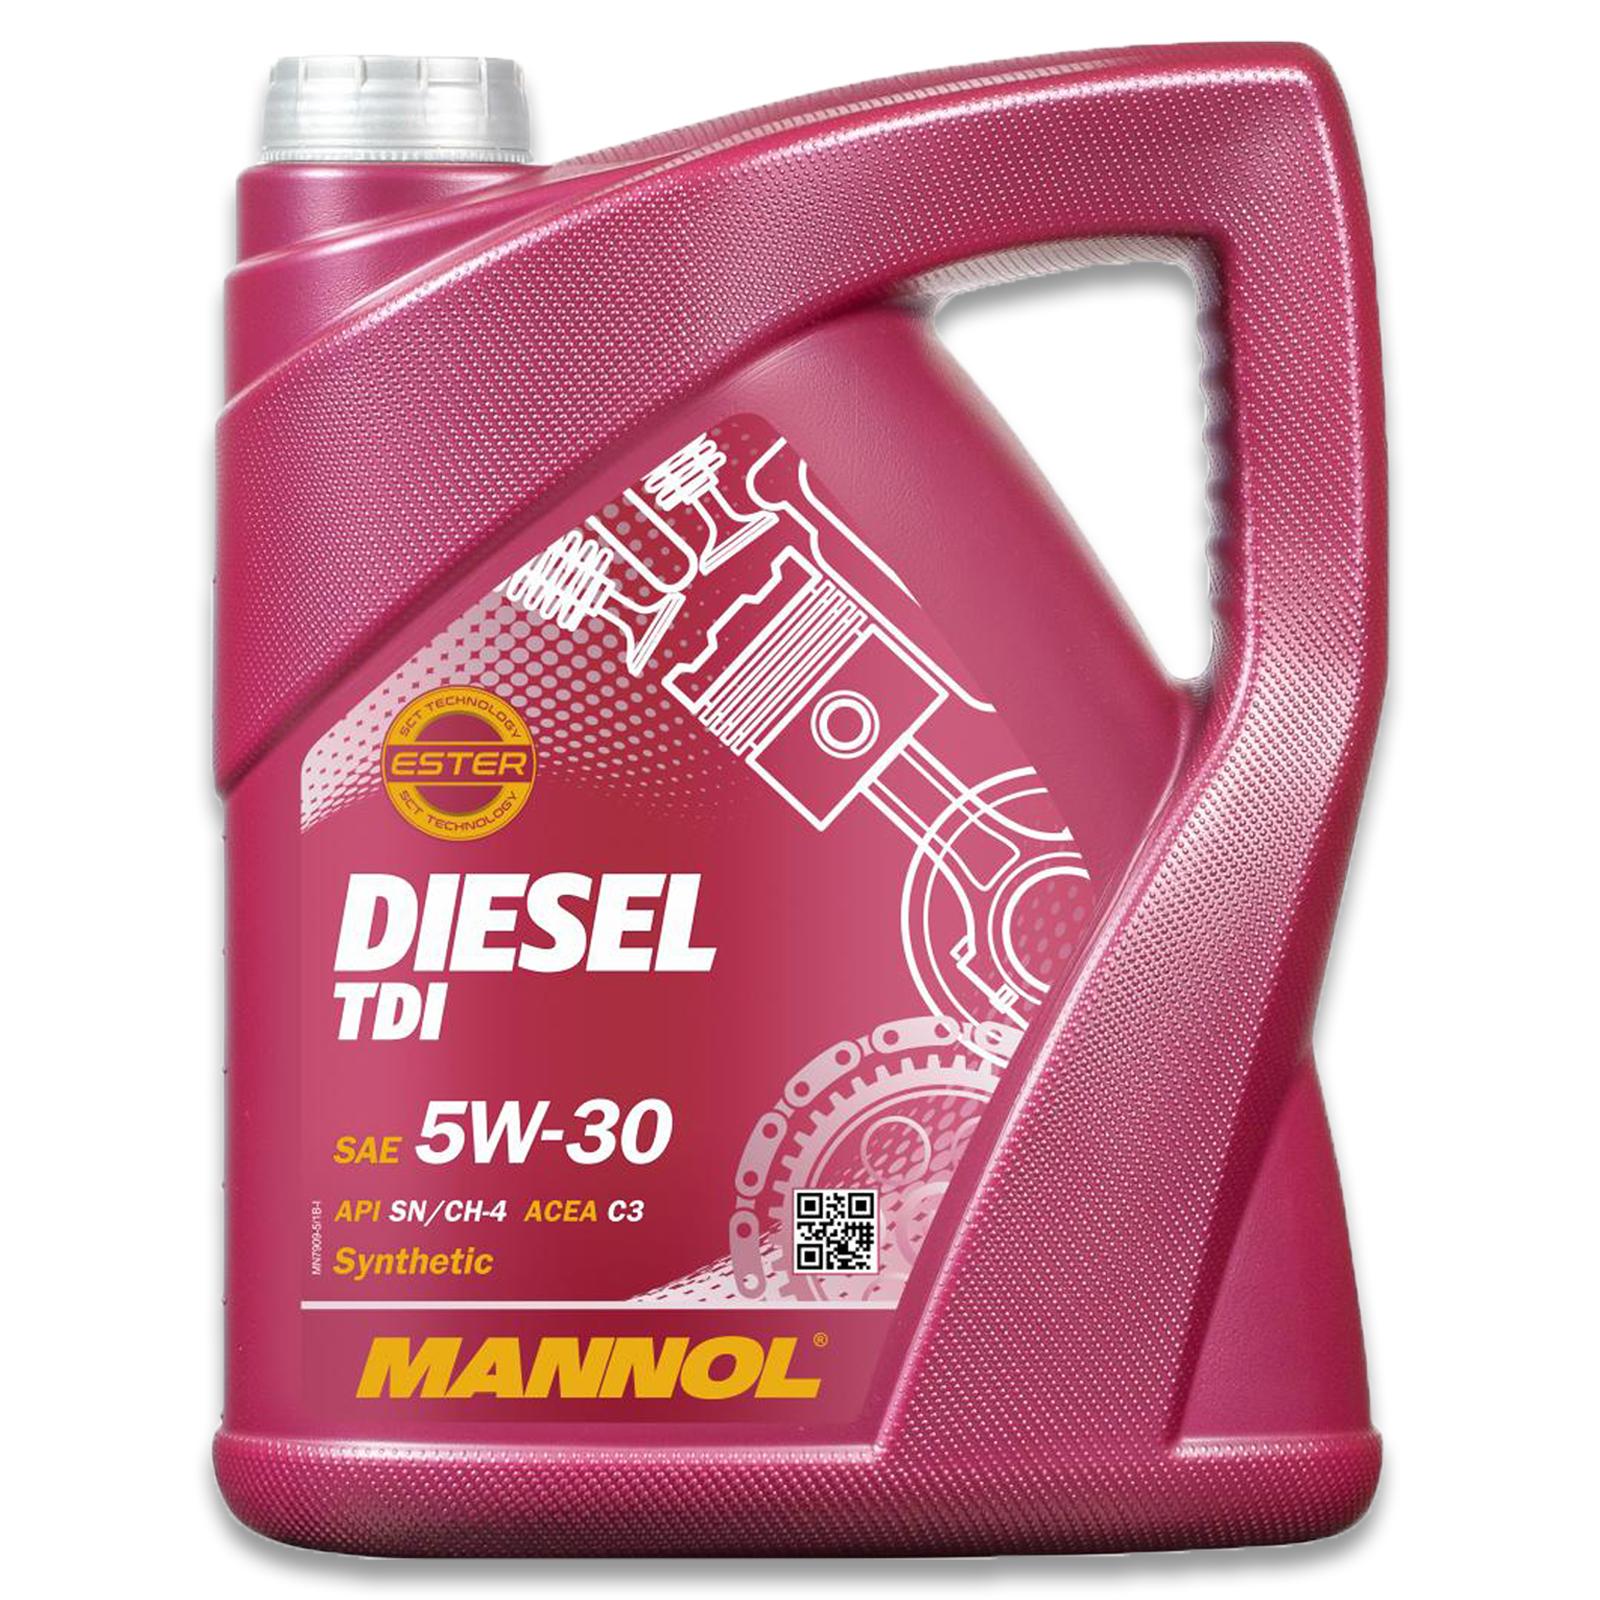 Mannol Motoröl Diesel TDI 5W-30 5L